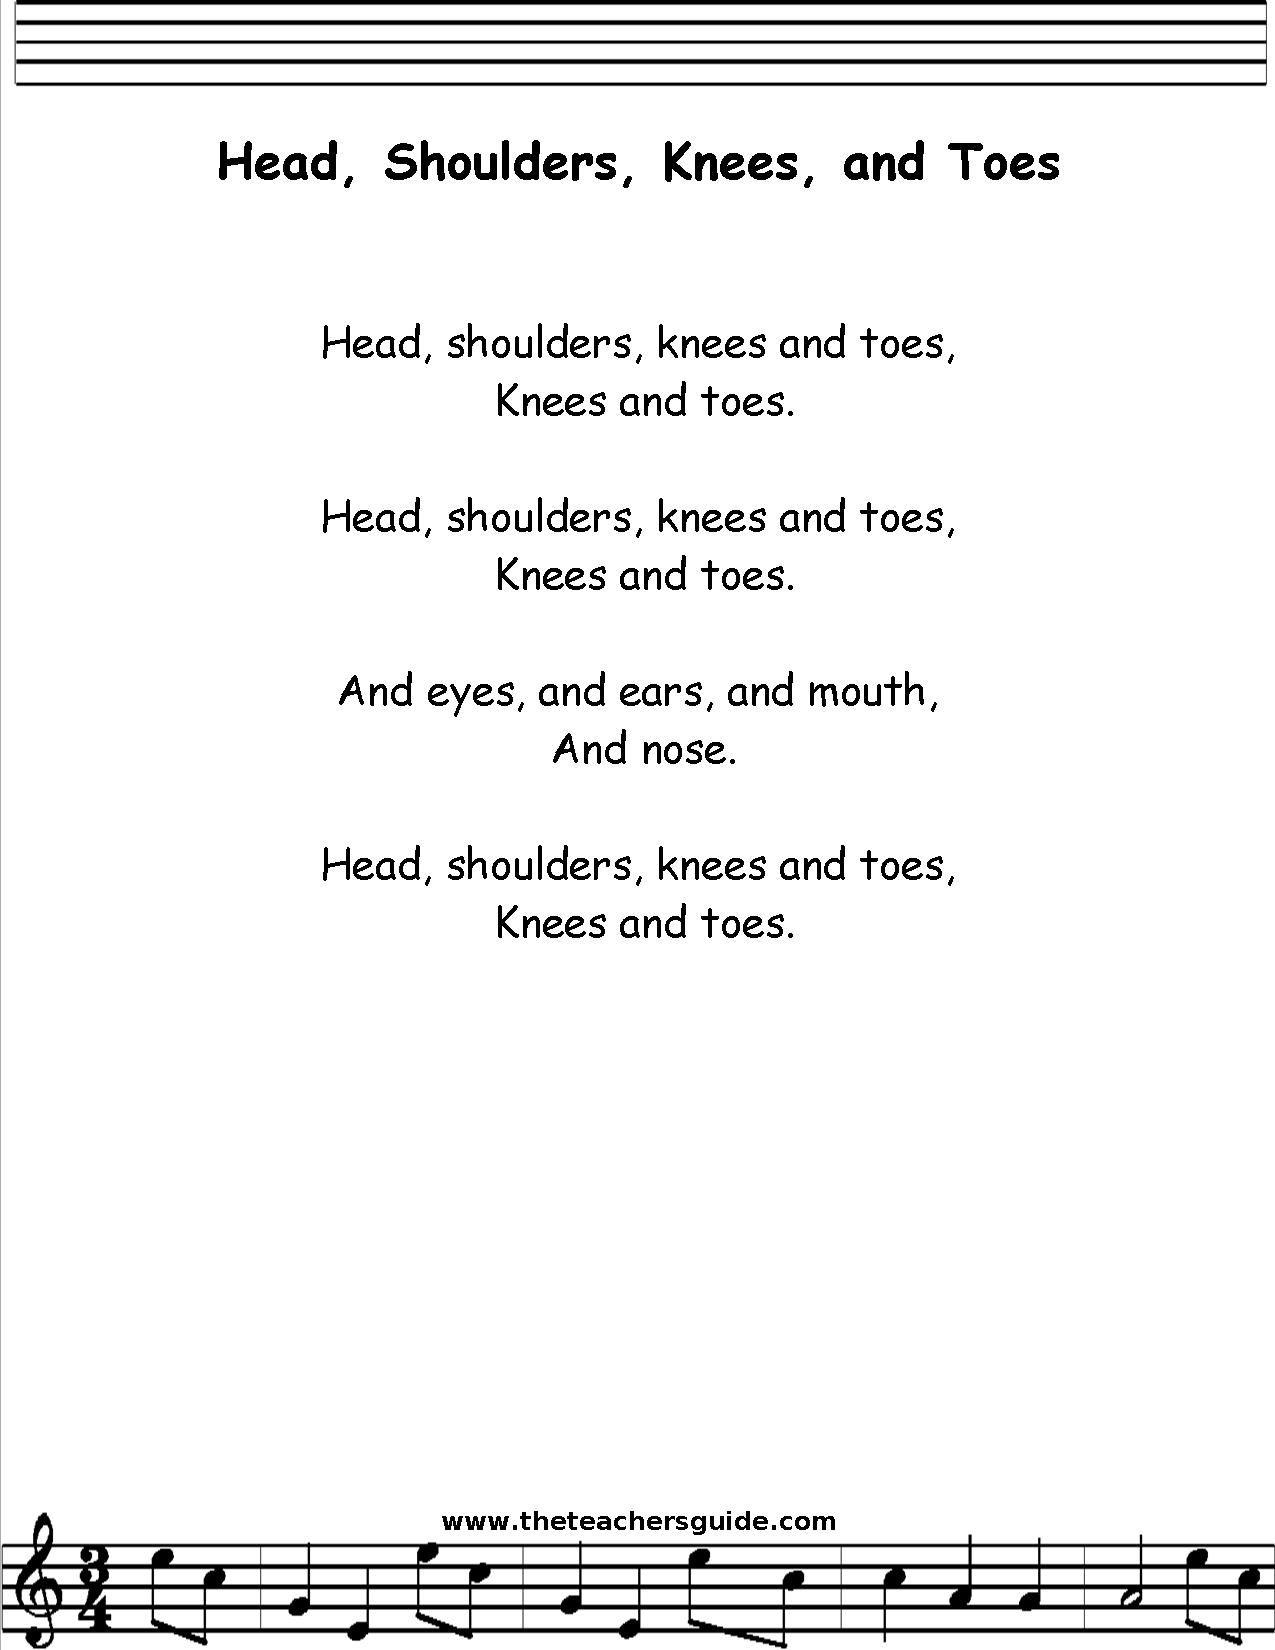 head shoulders knees and toes lyrics printout midi and video